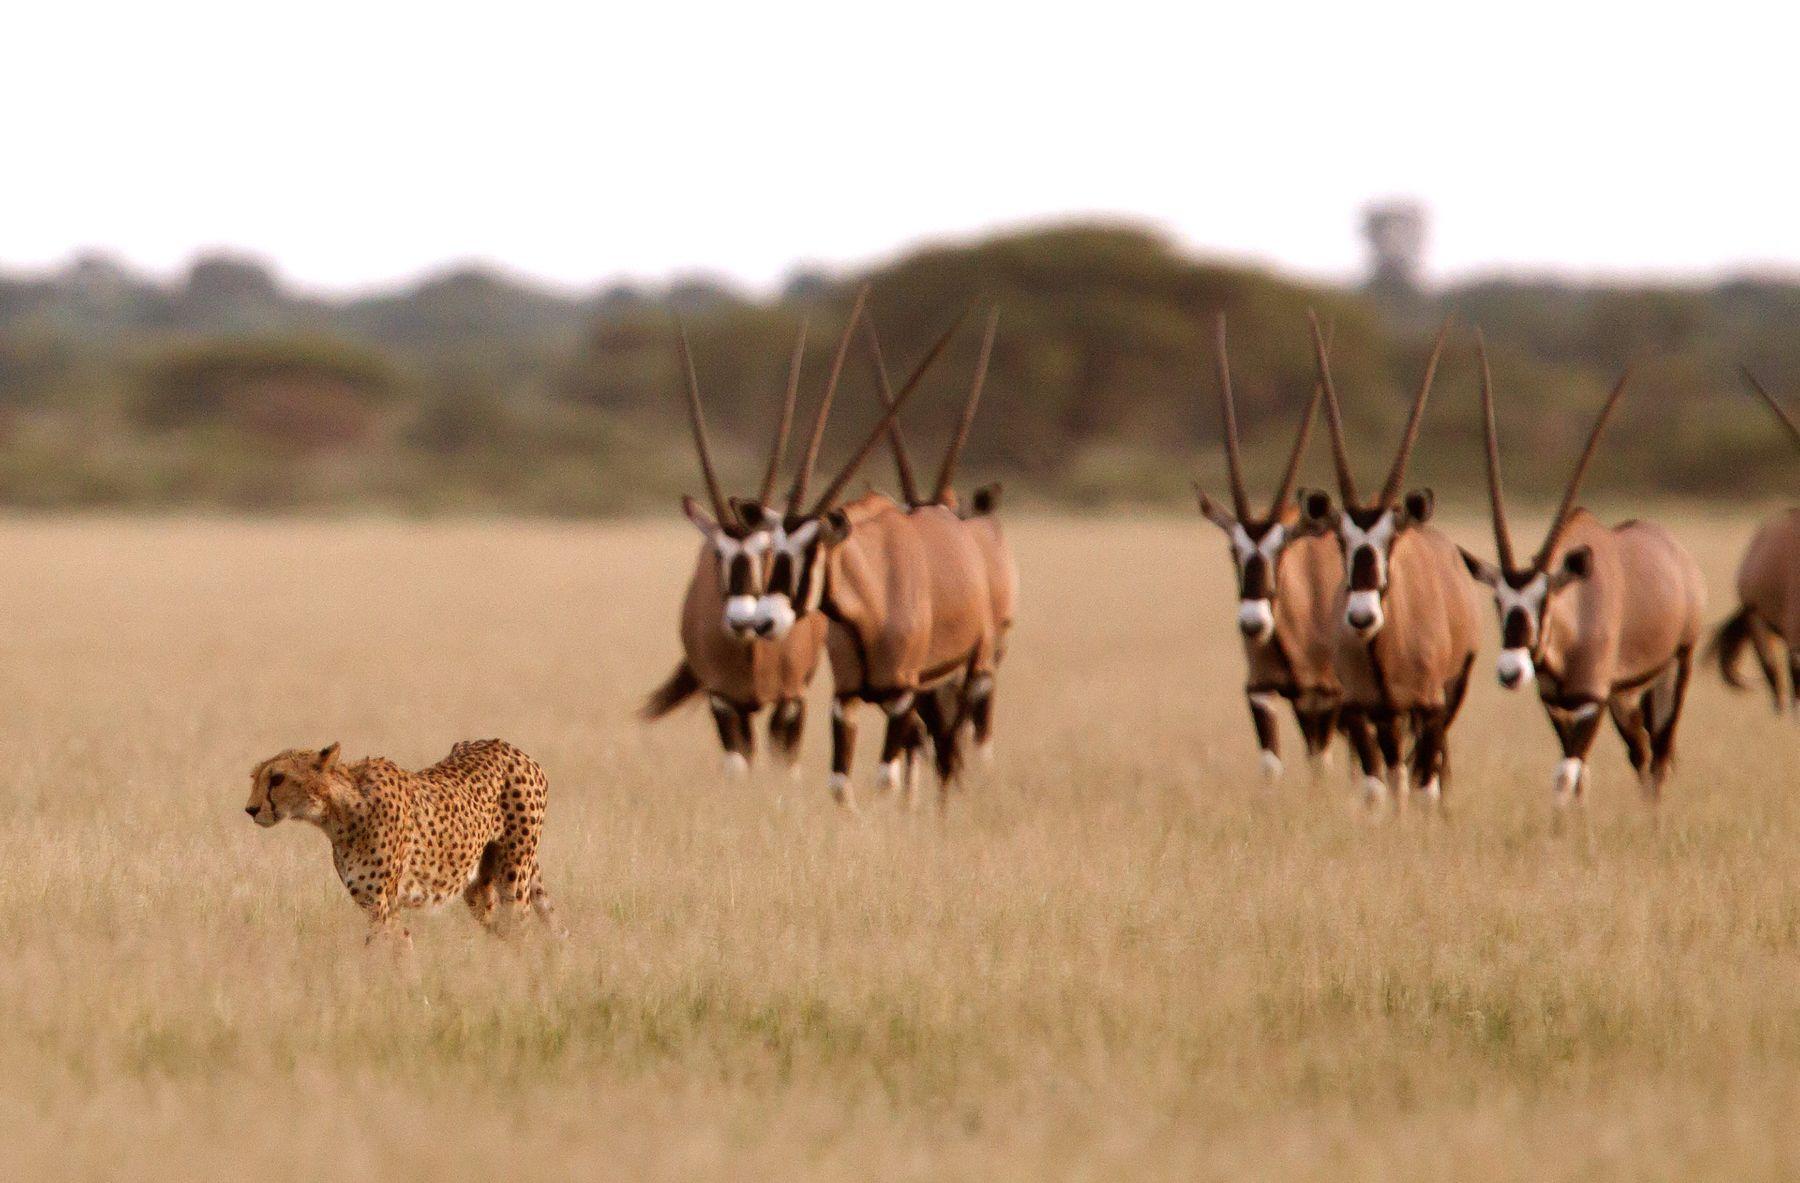 A Cheetah is followed by some Gemsboks in Botswana